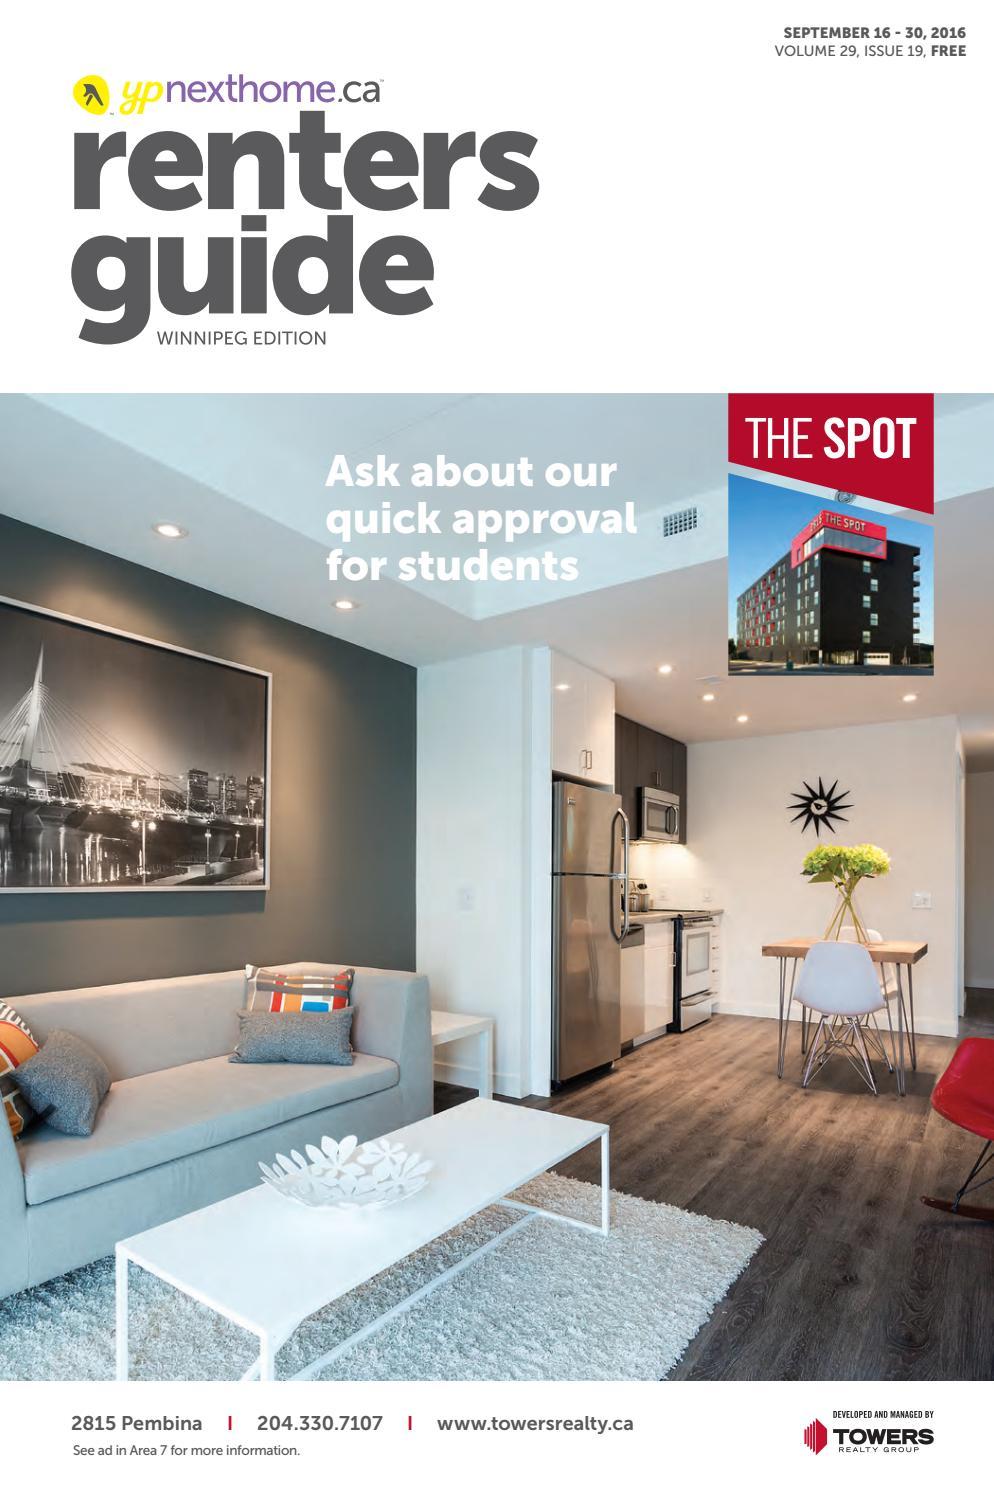 WINNIPEG Renters Guide - 16 Sep, 2016 by NextHome - issuu